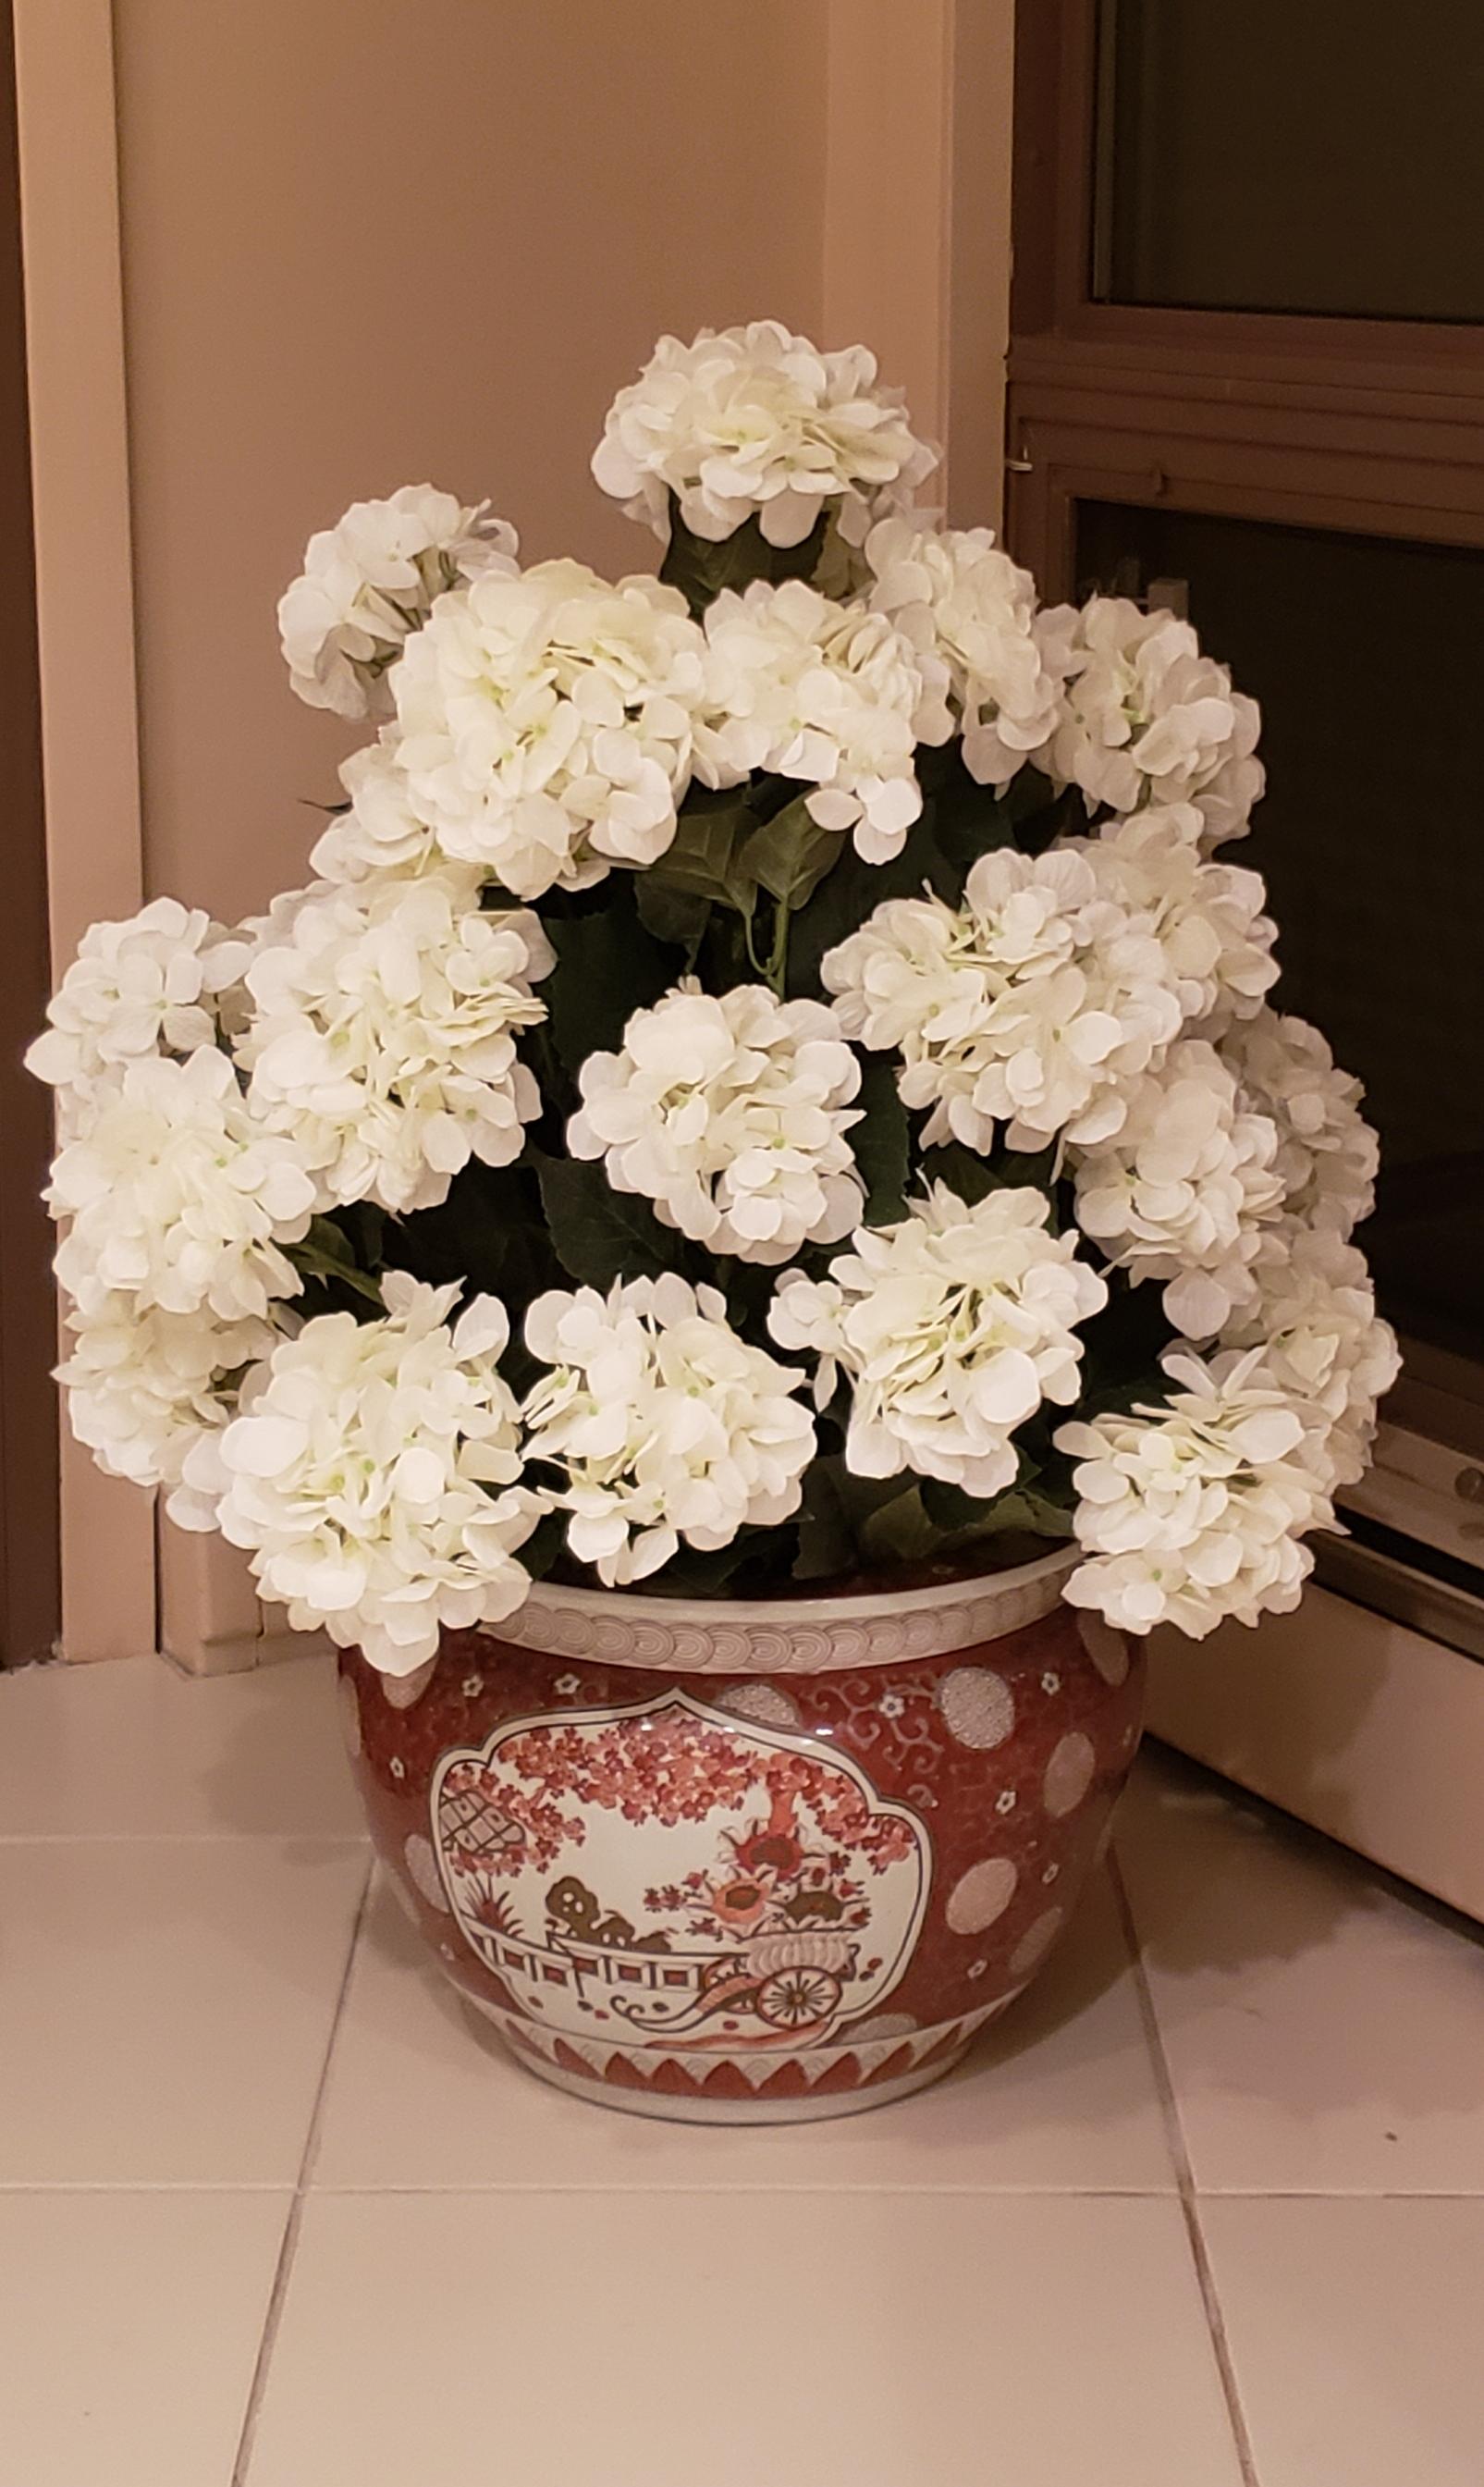 New white Hydrangea